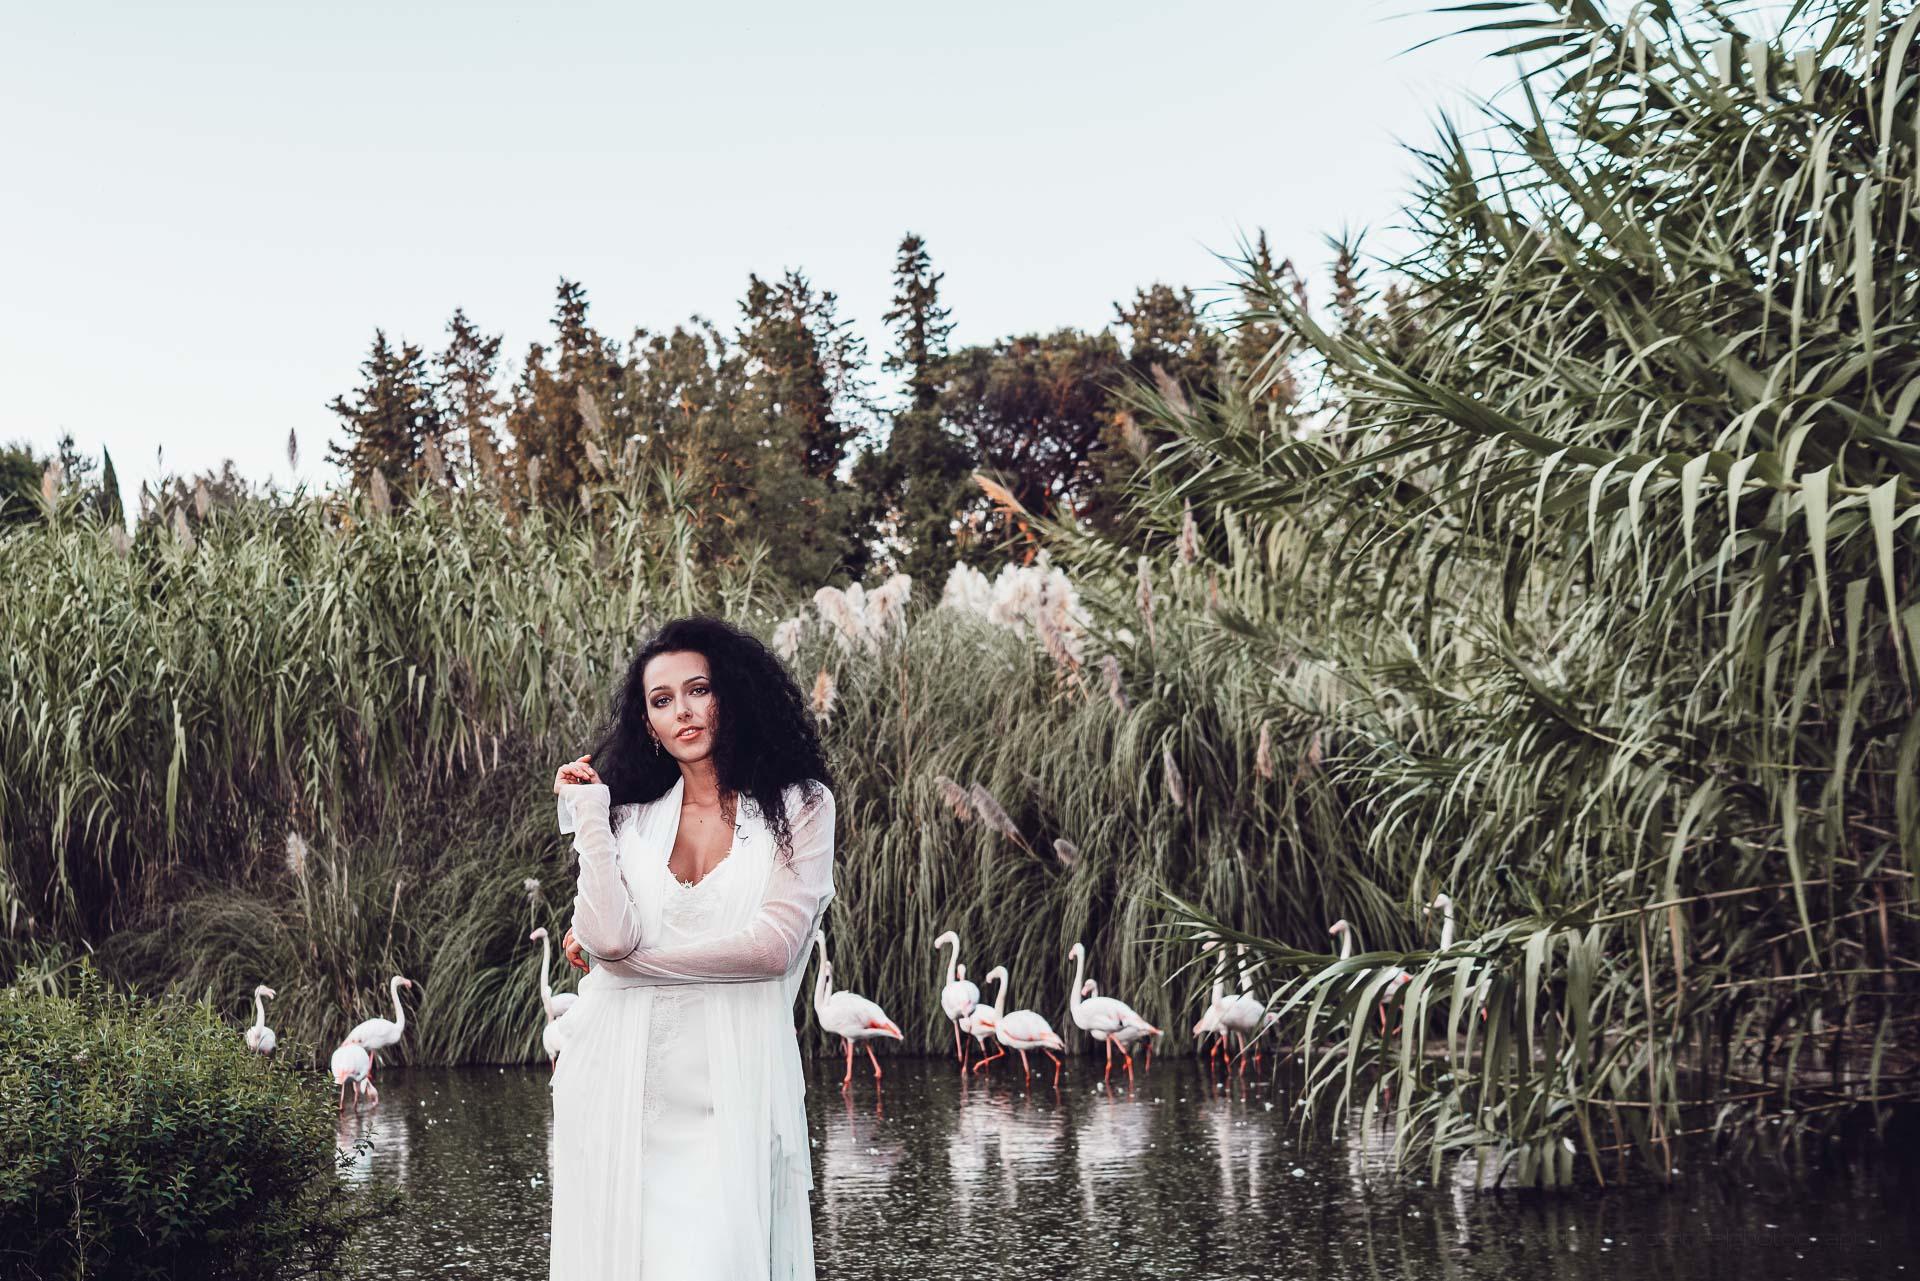 Look book Anastasia Ronca for MontanaAgency |Raffaele Rotondo |Photography-3545